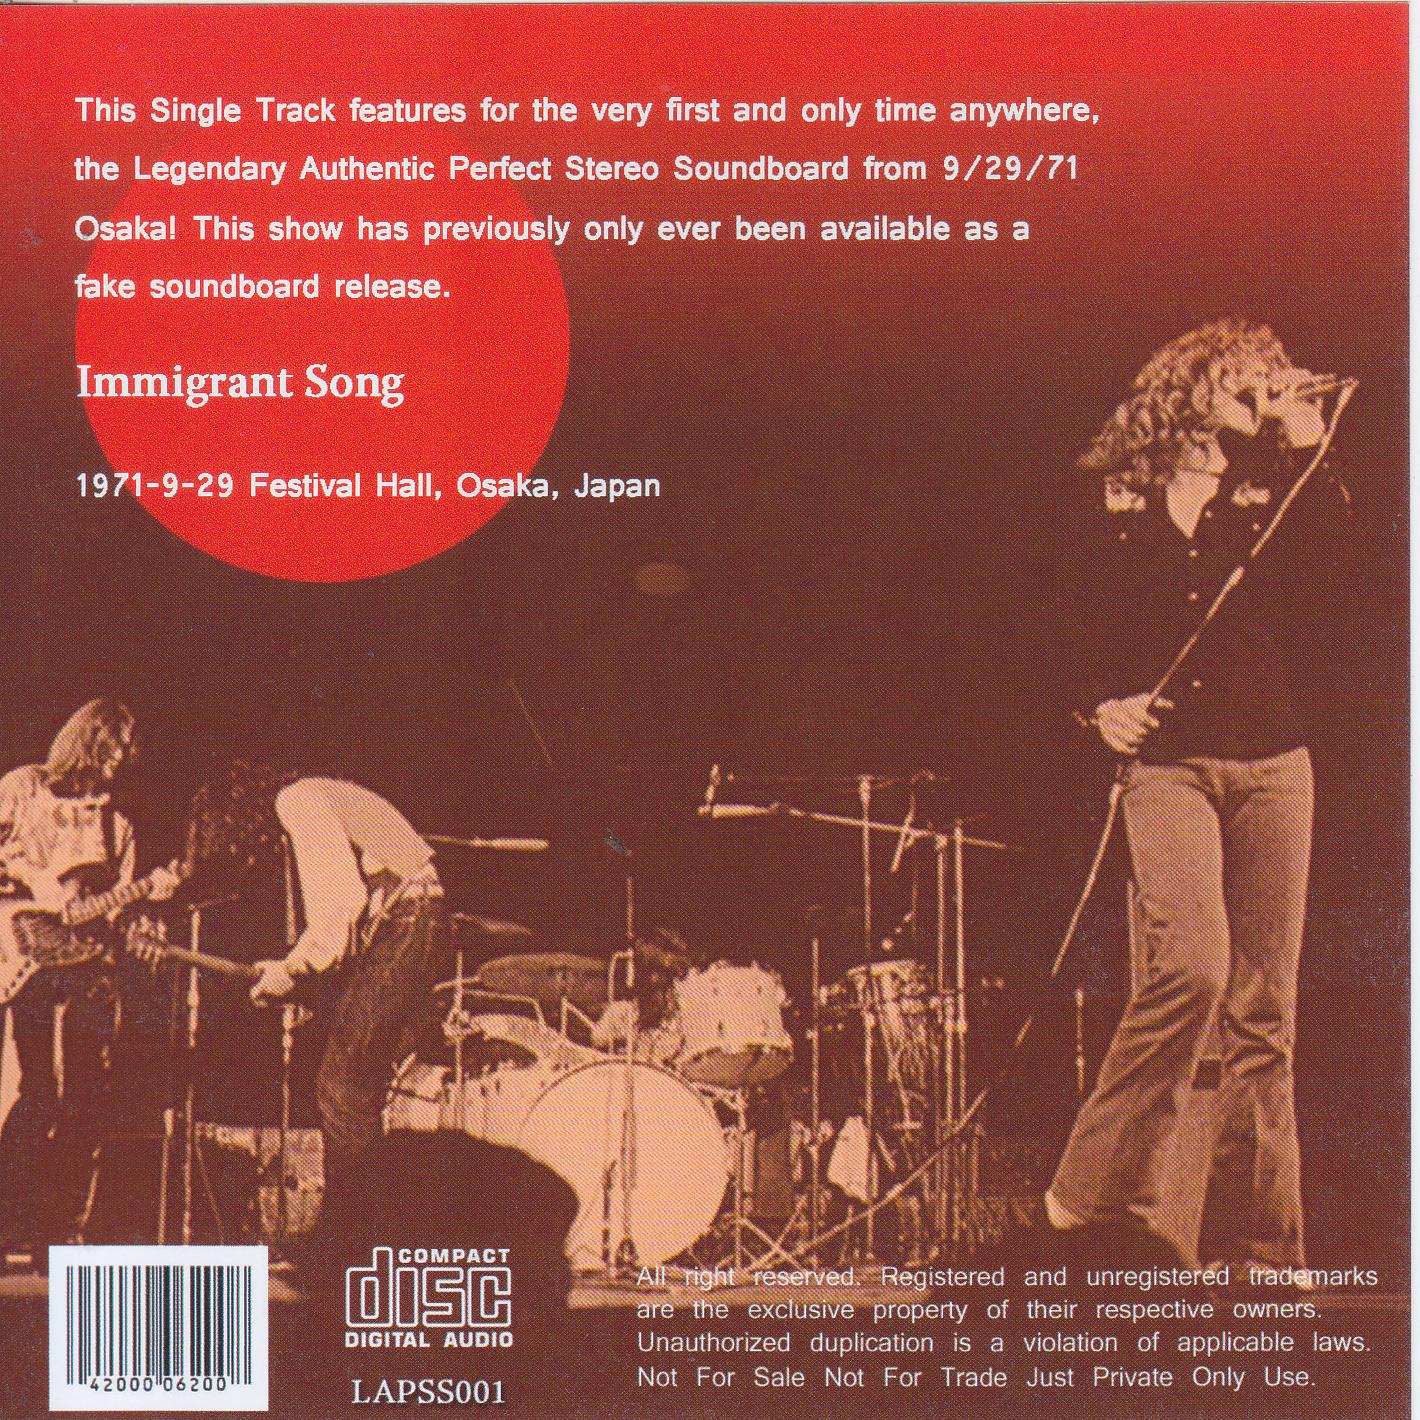 Led Zeppelin 929 Immigrant Song Soundboard Single 1Single CD